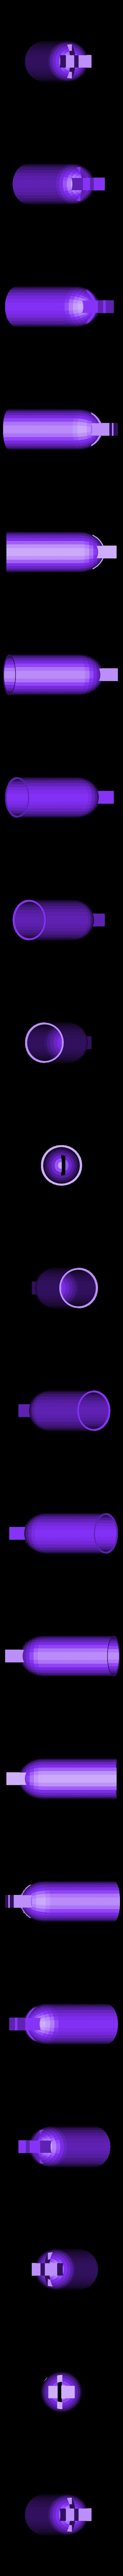 tree_topper_base.stl Download free STL file Mr Hankey & South Park Sign • 3D printing design, ChaosCoreTech